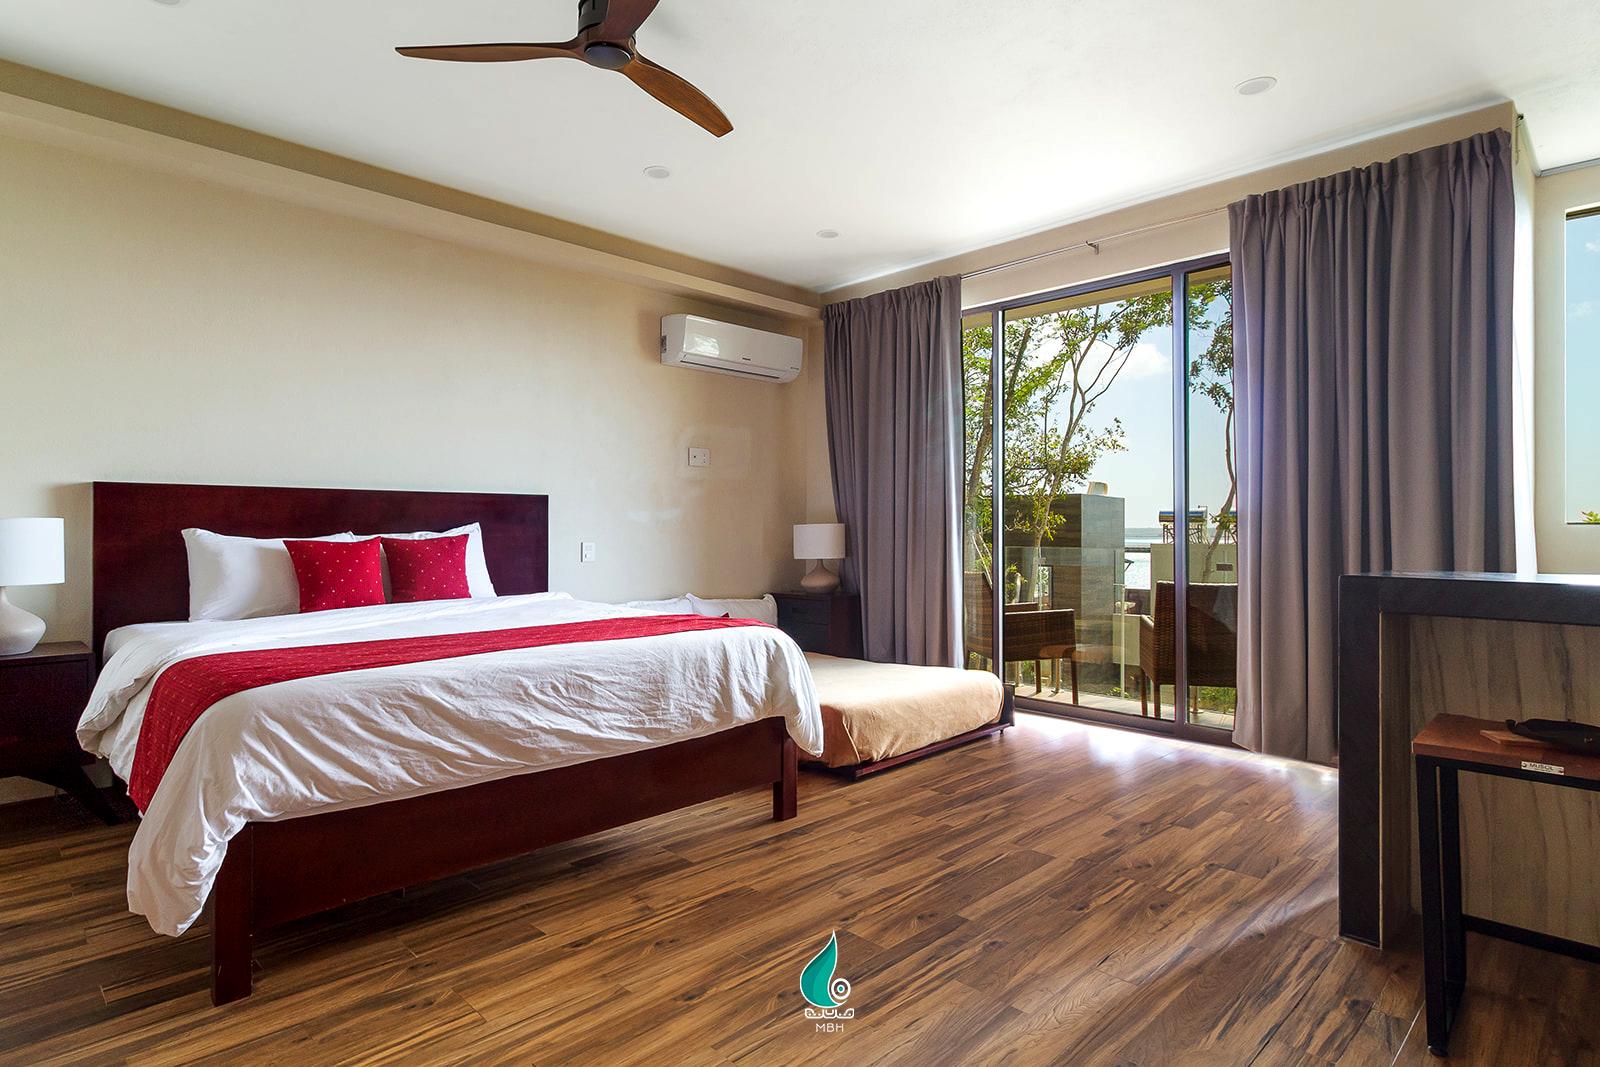 2 Beds Suite